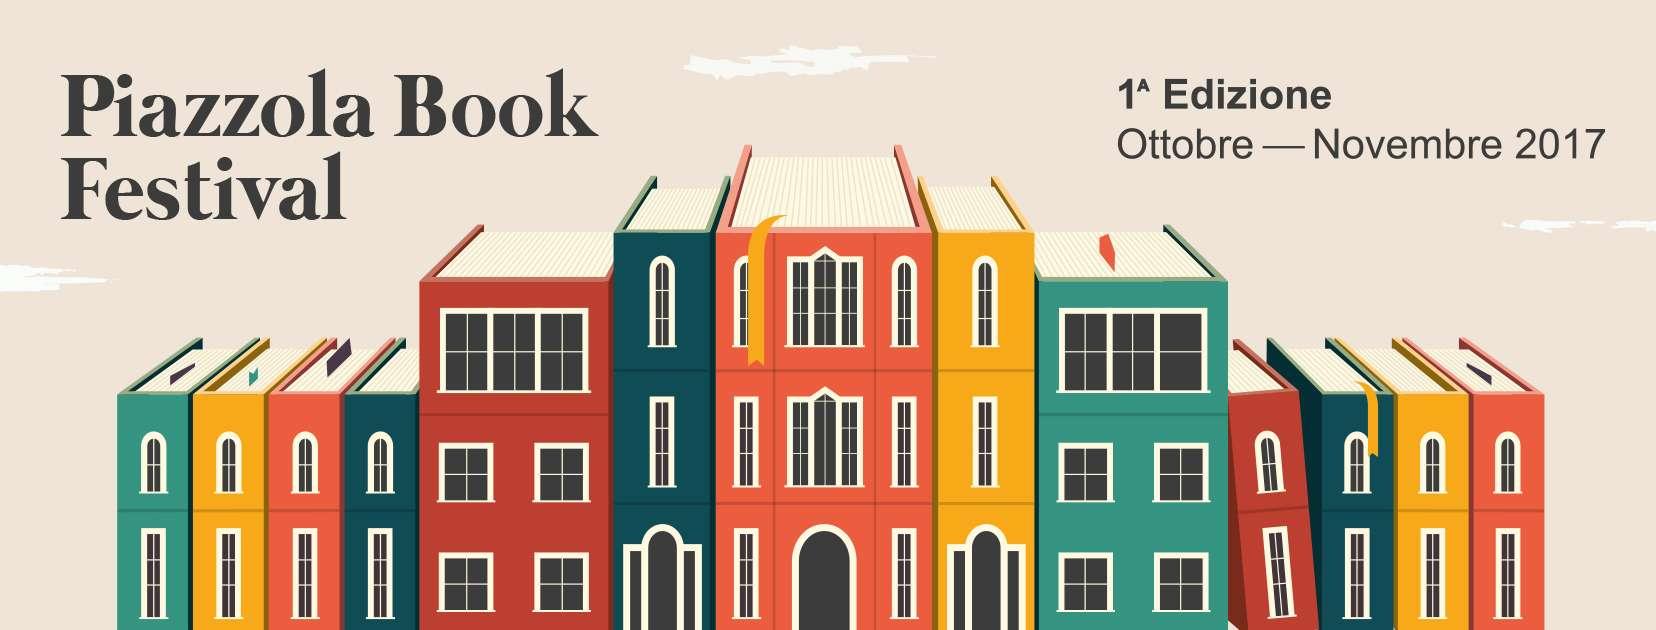 Piazzola book festival